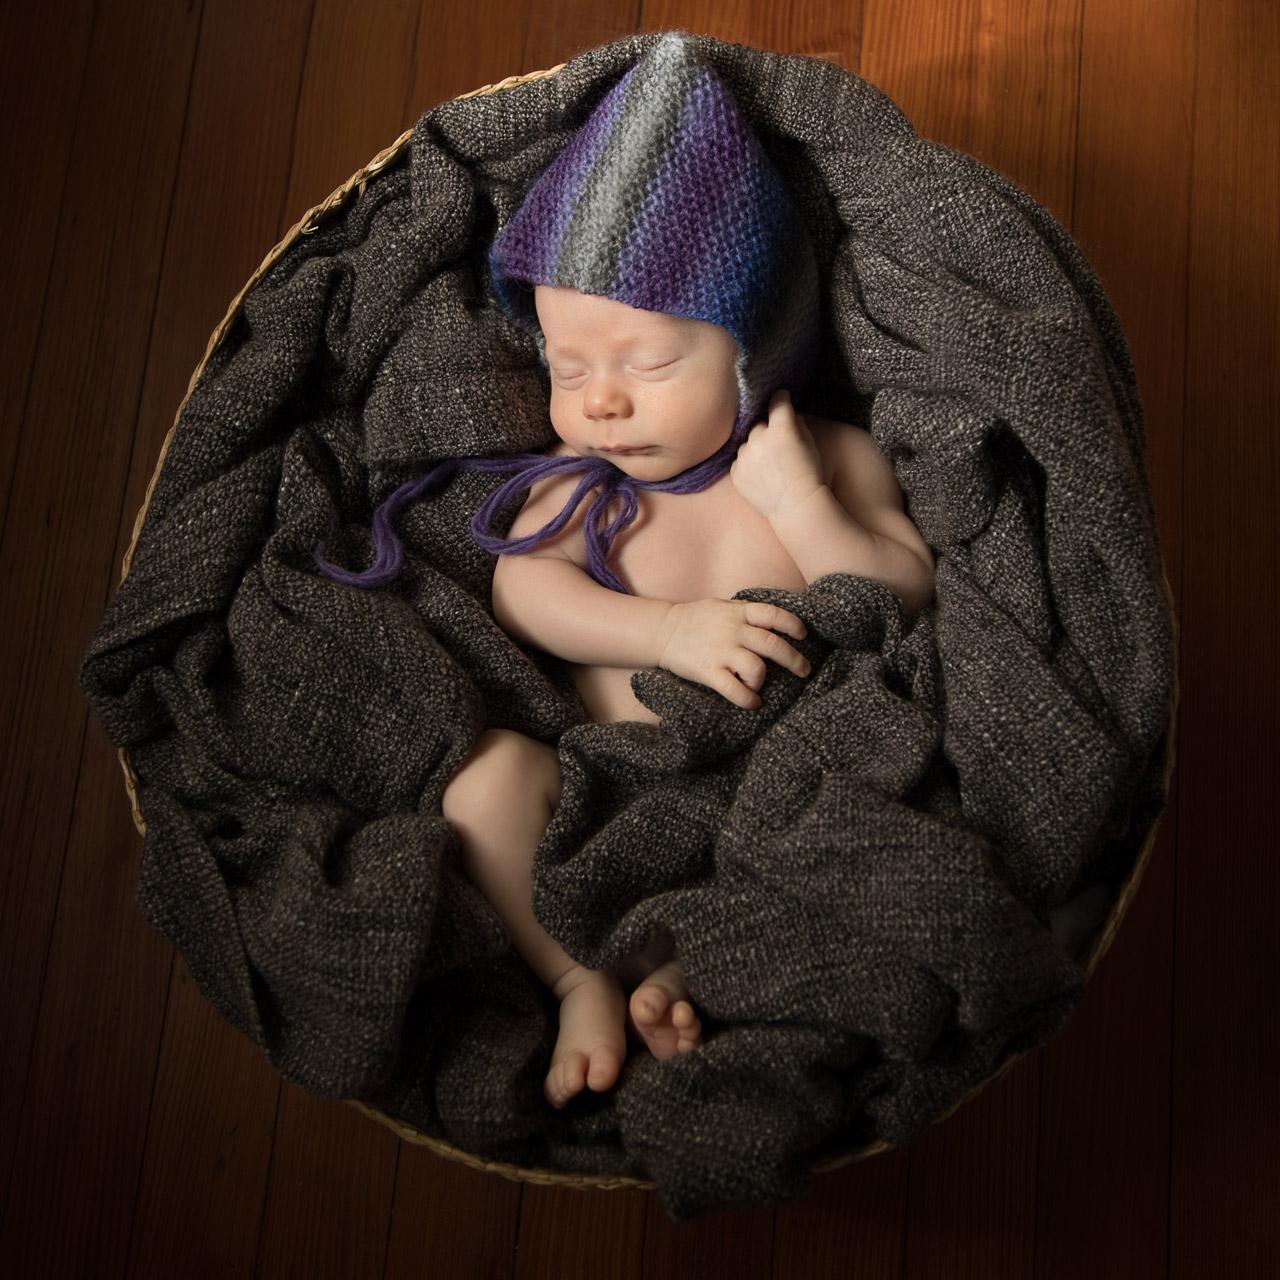 Houston_newborn_photographer_baby_knit_hat